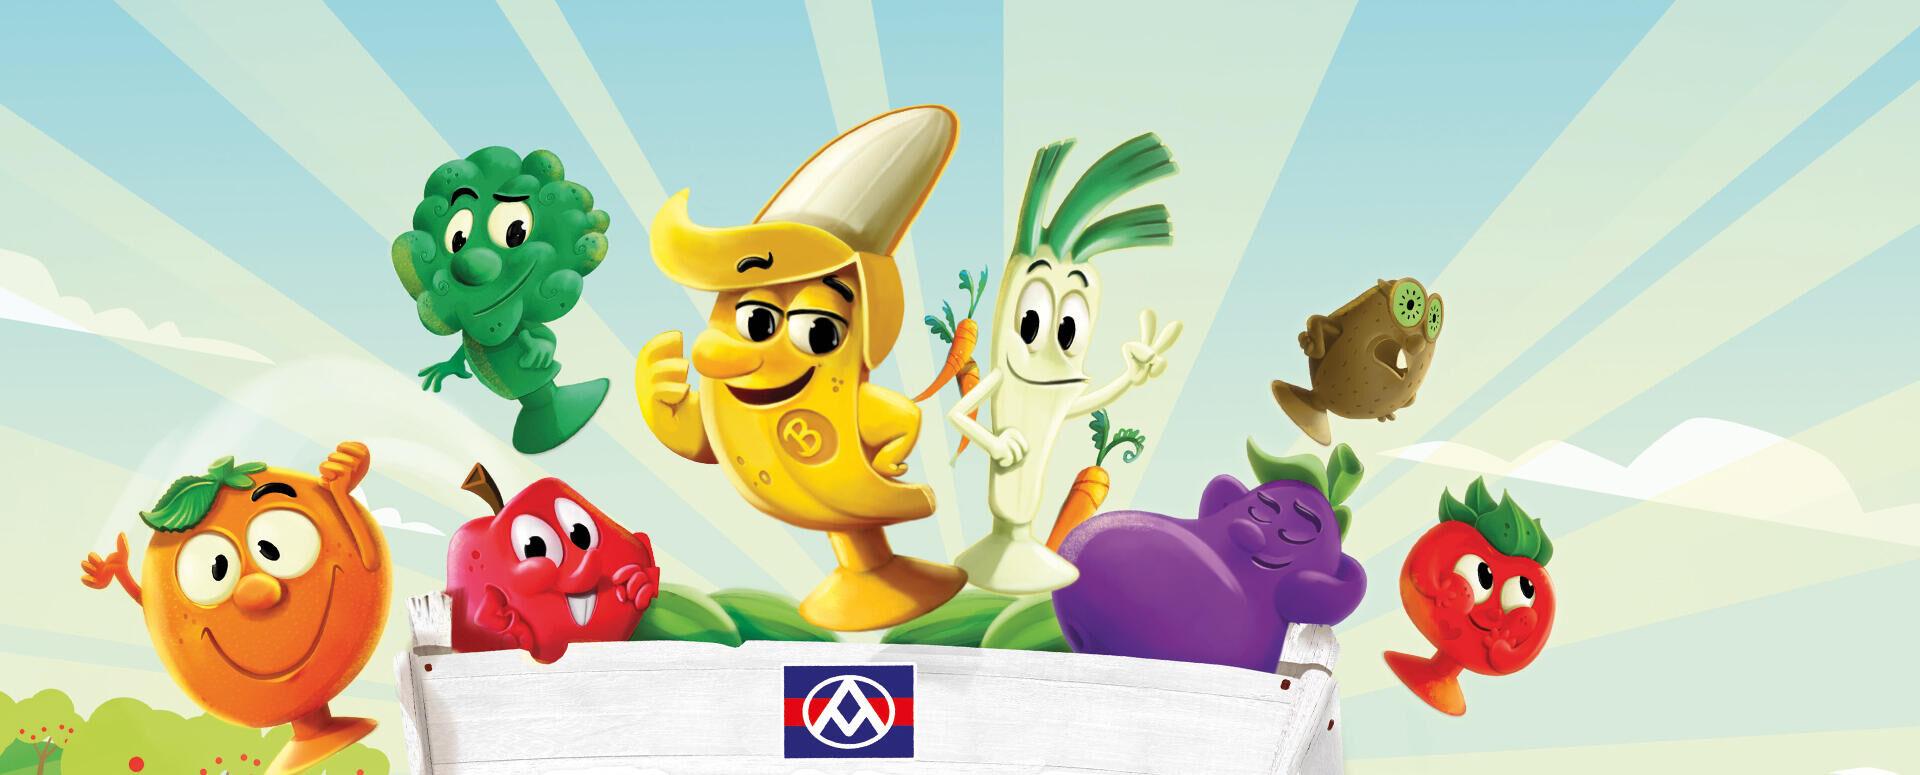 PX Mart diversifies national diets